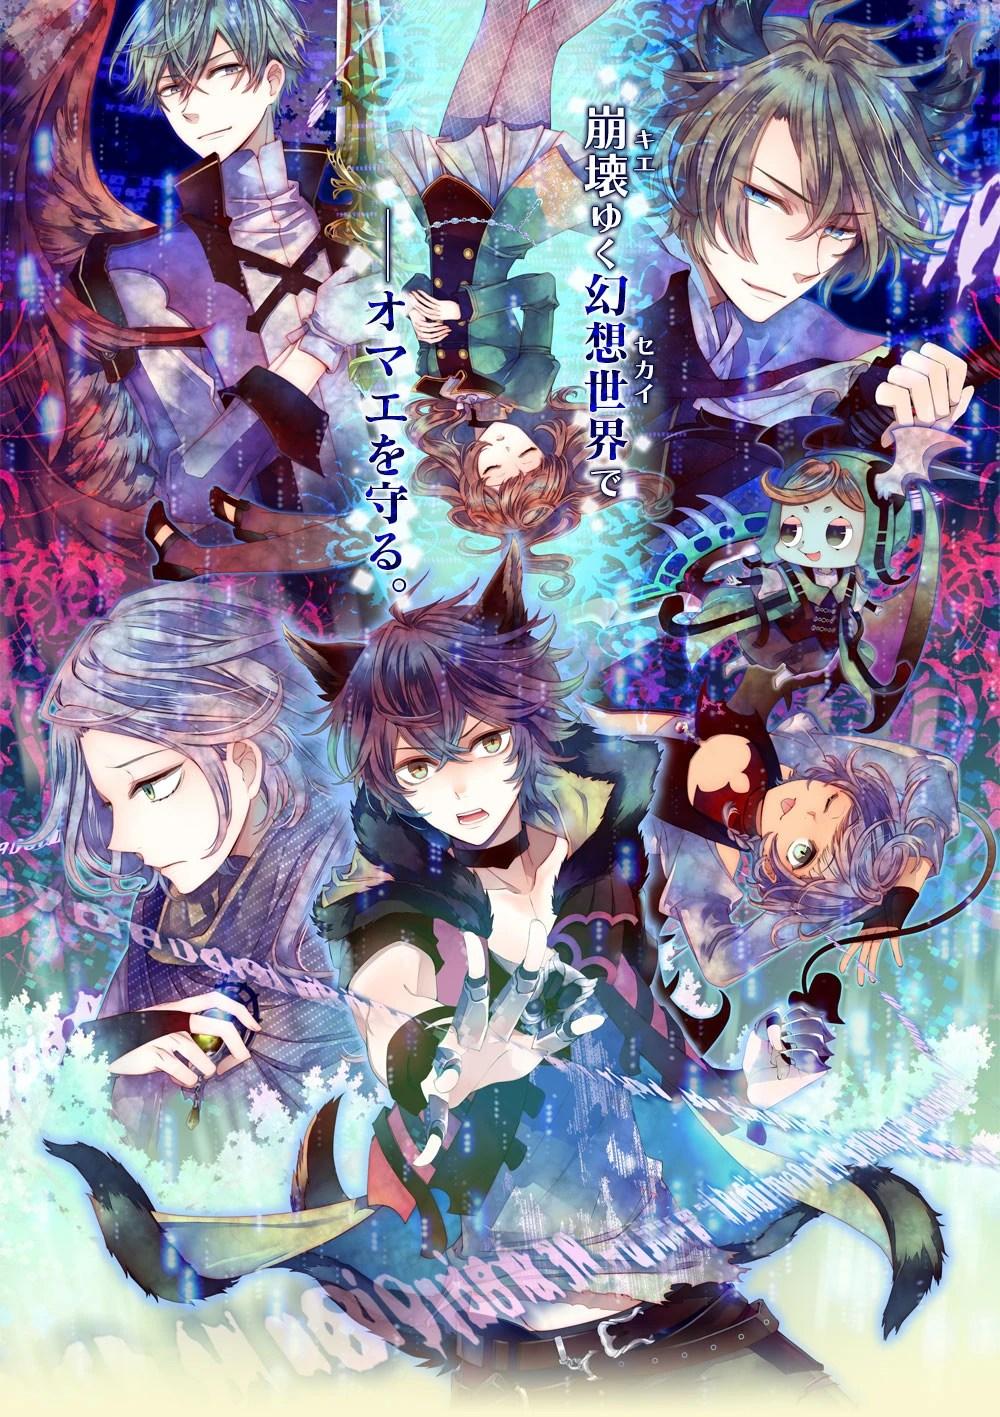 Psp Wallpaper Anime Period Cube Otome Games Wikia Fandom Powered By Wikia